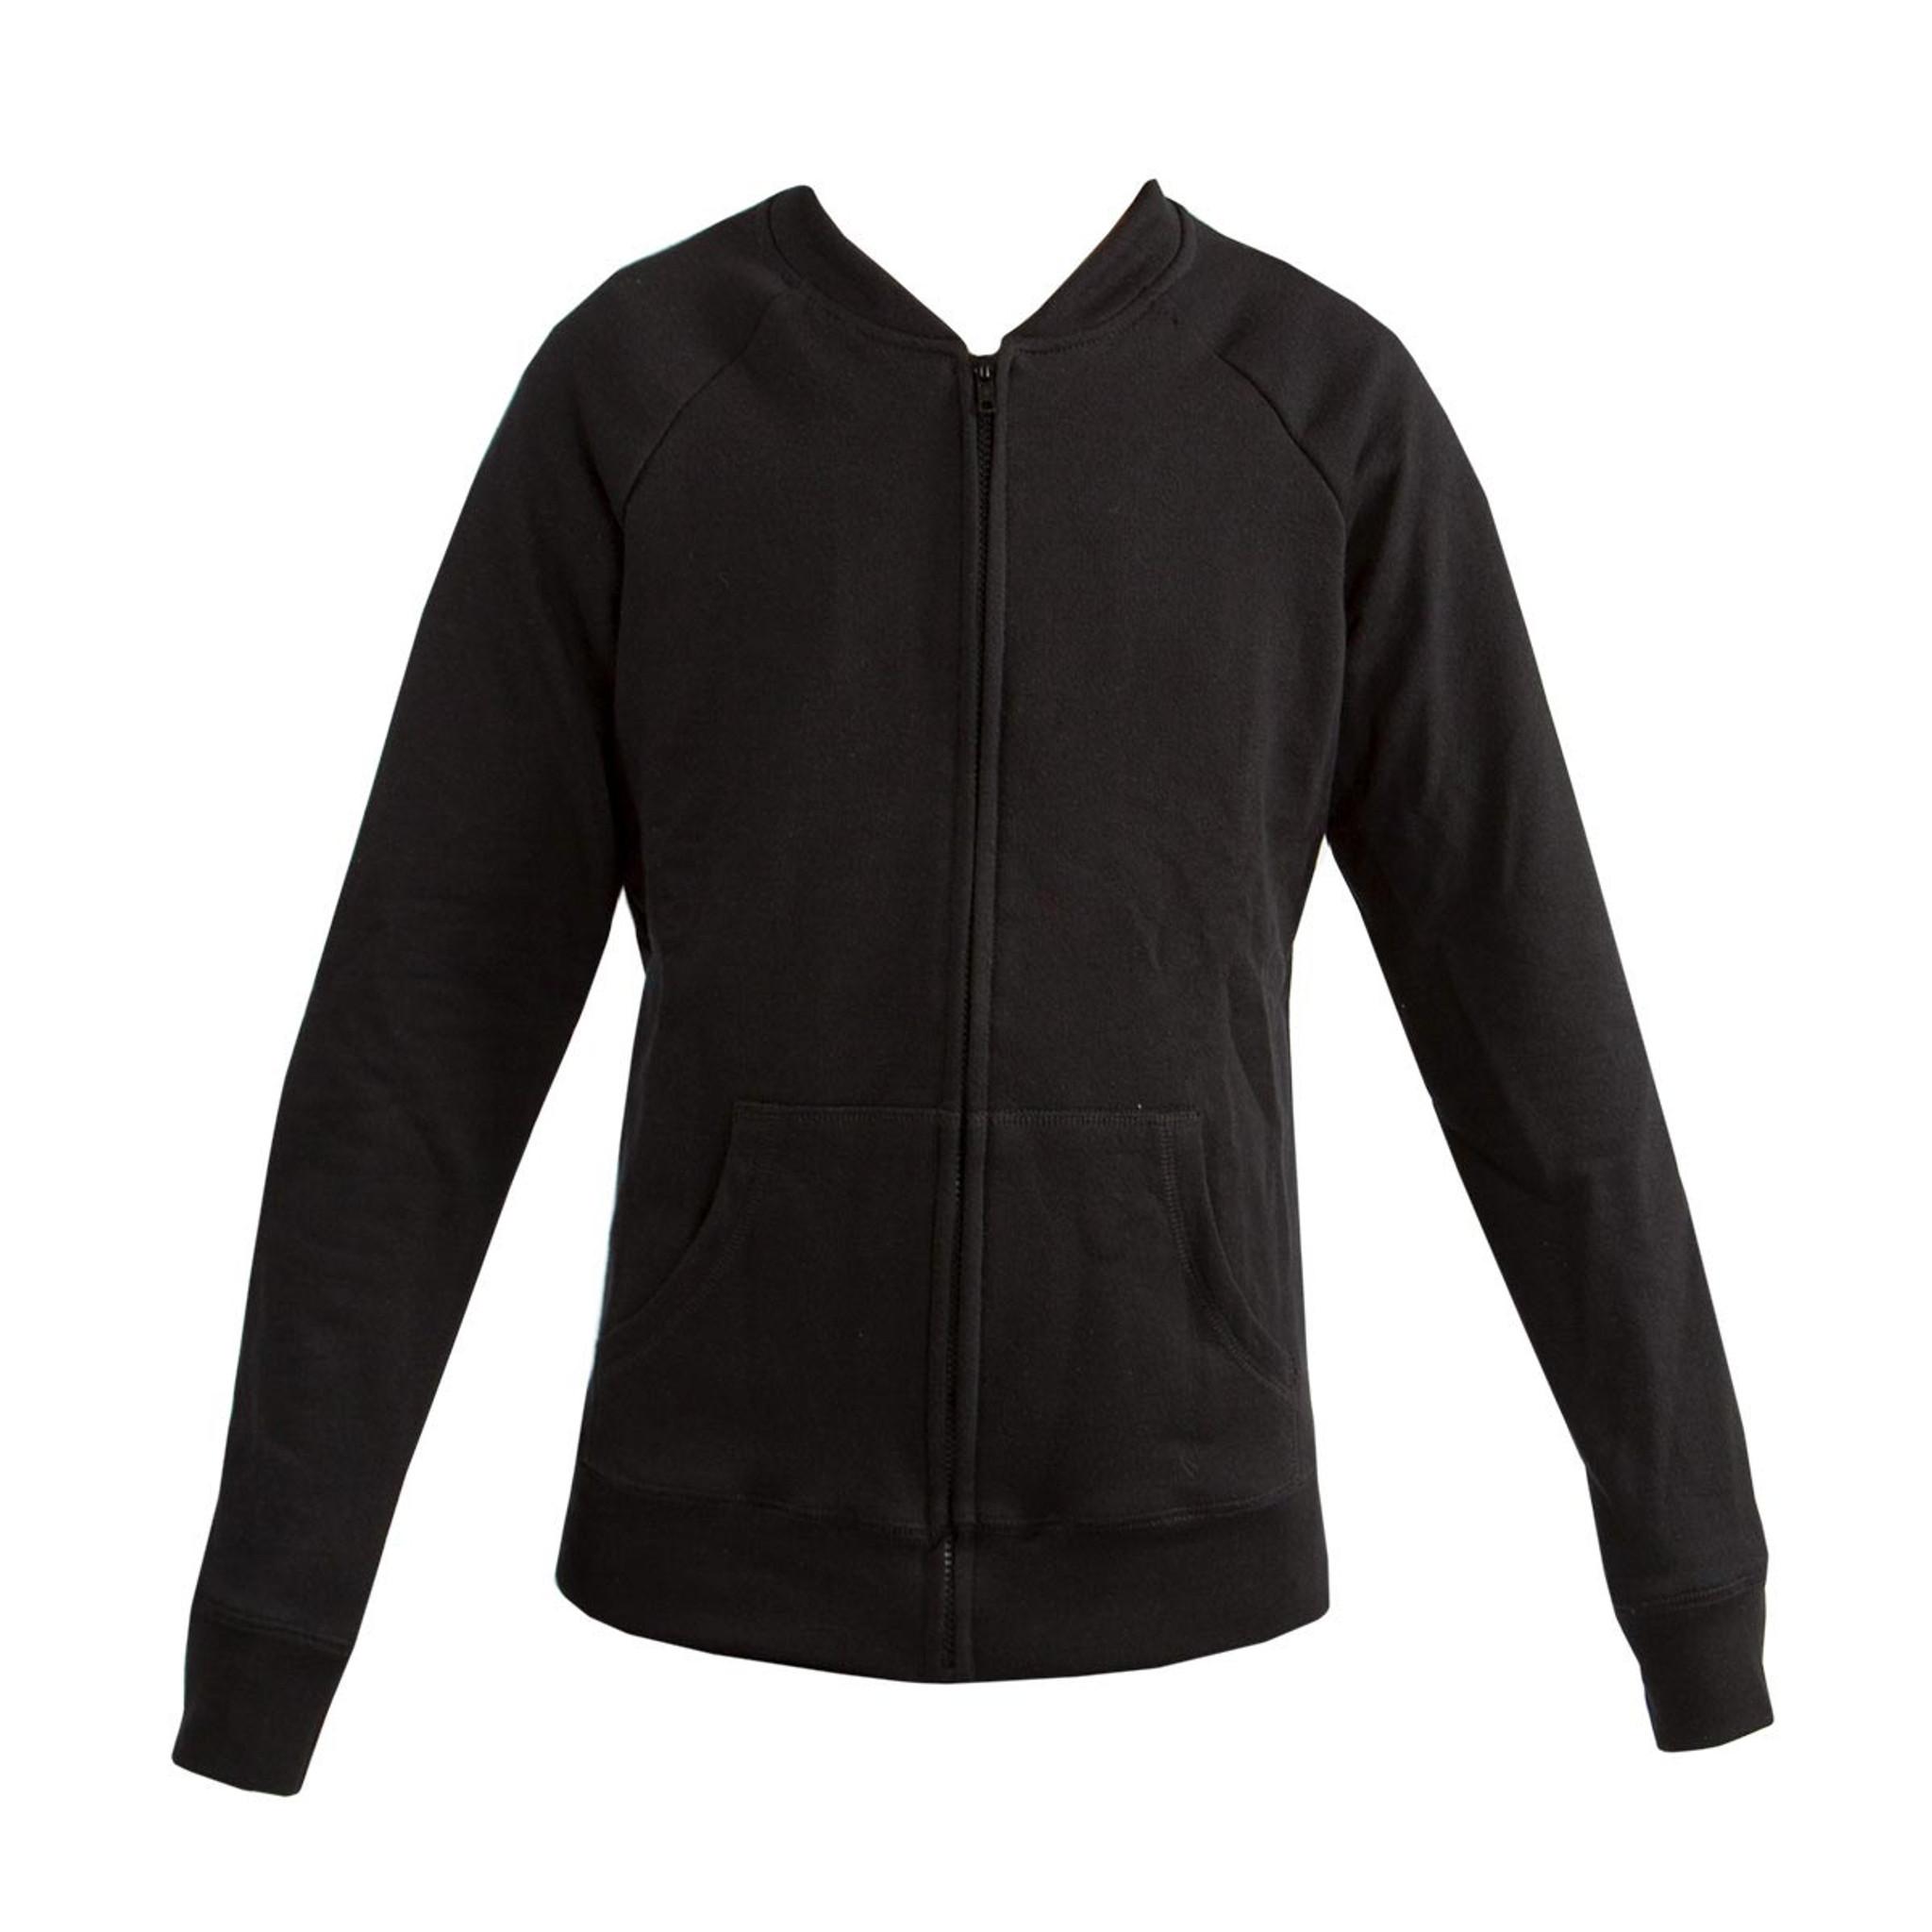 Energetiks Dance Jacket - Children's Unisex Dance Jacket